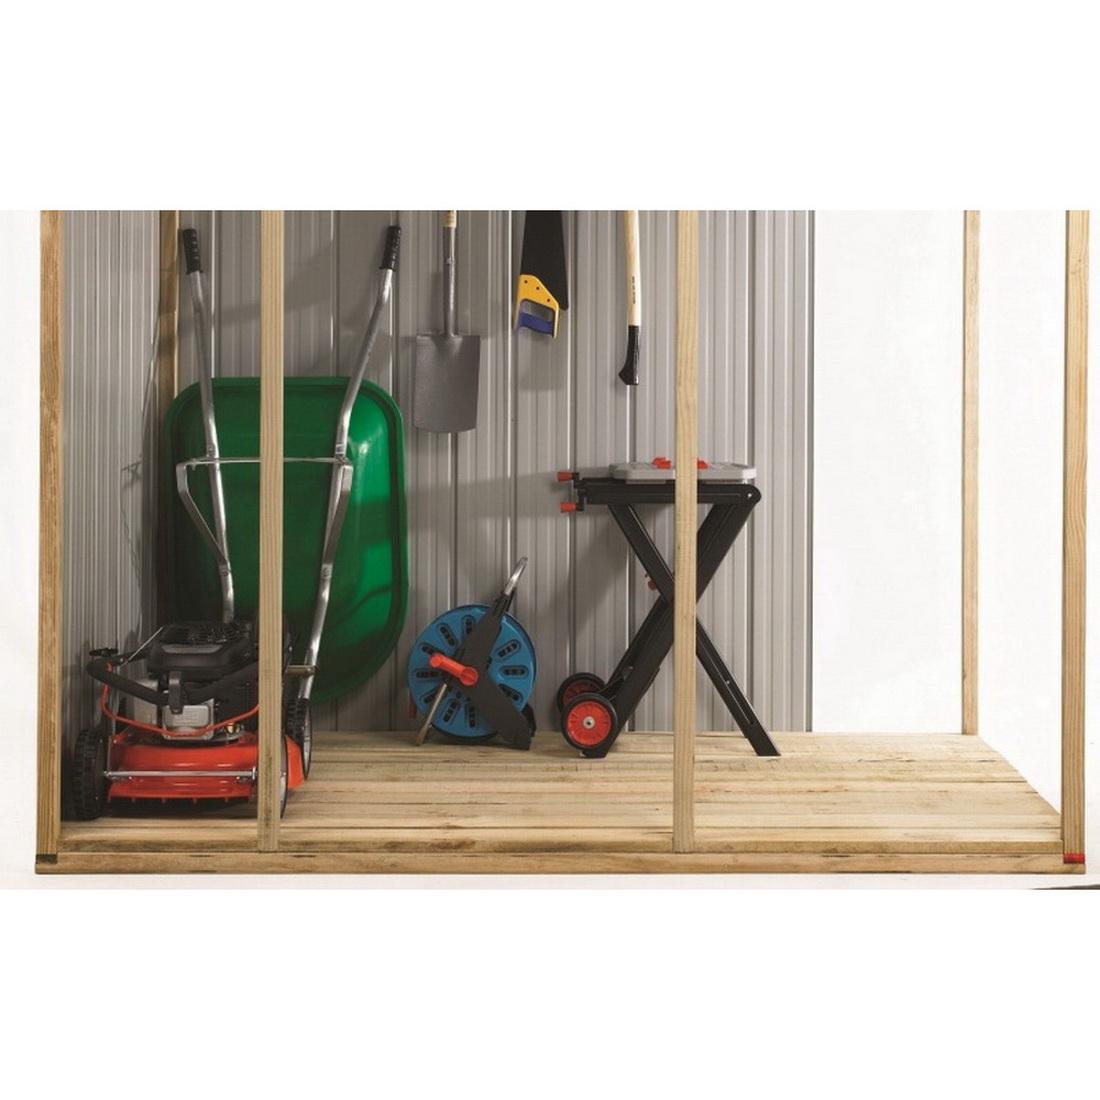 Kiwi Garden Shed Timber Floor Zinc